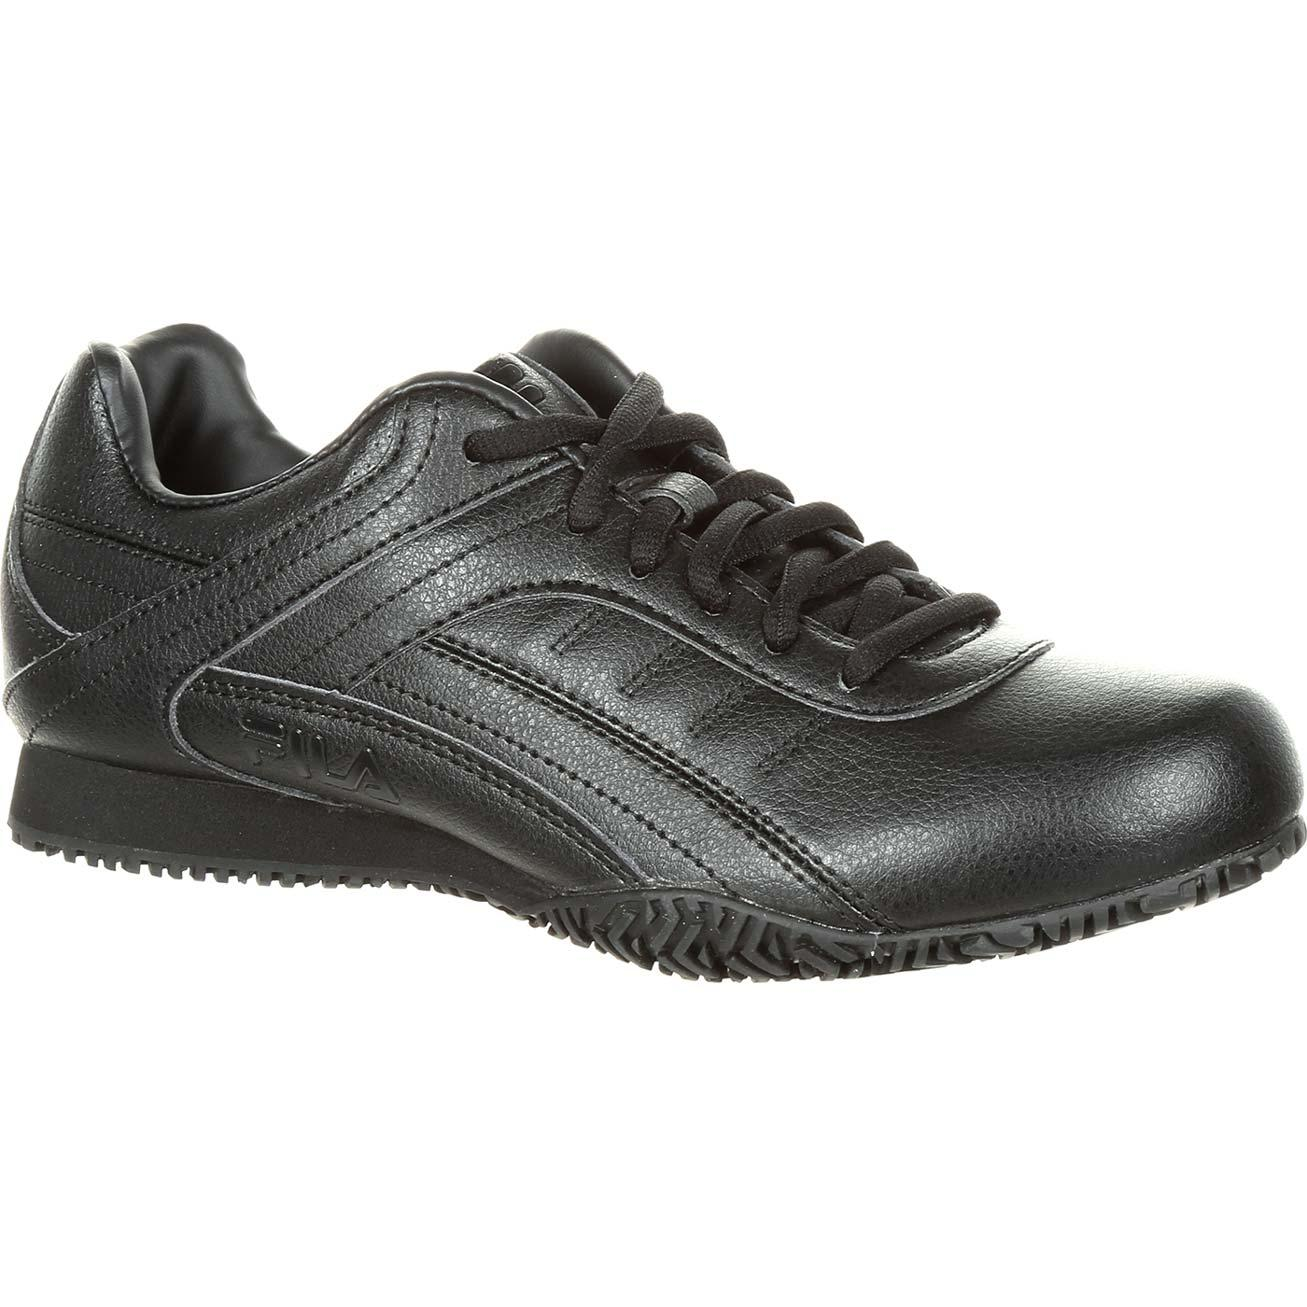 13013cdc28 Fila Memory Elleray Women's Slip-Resistant Work Athletic Shoe